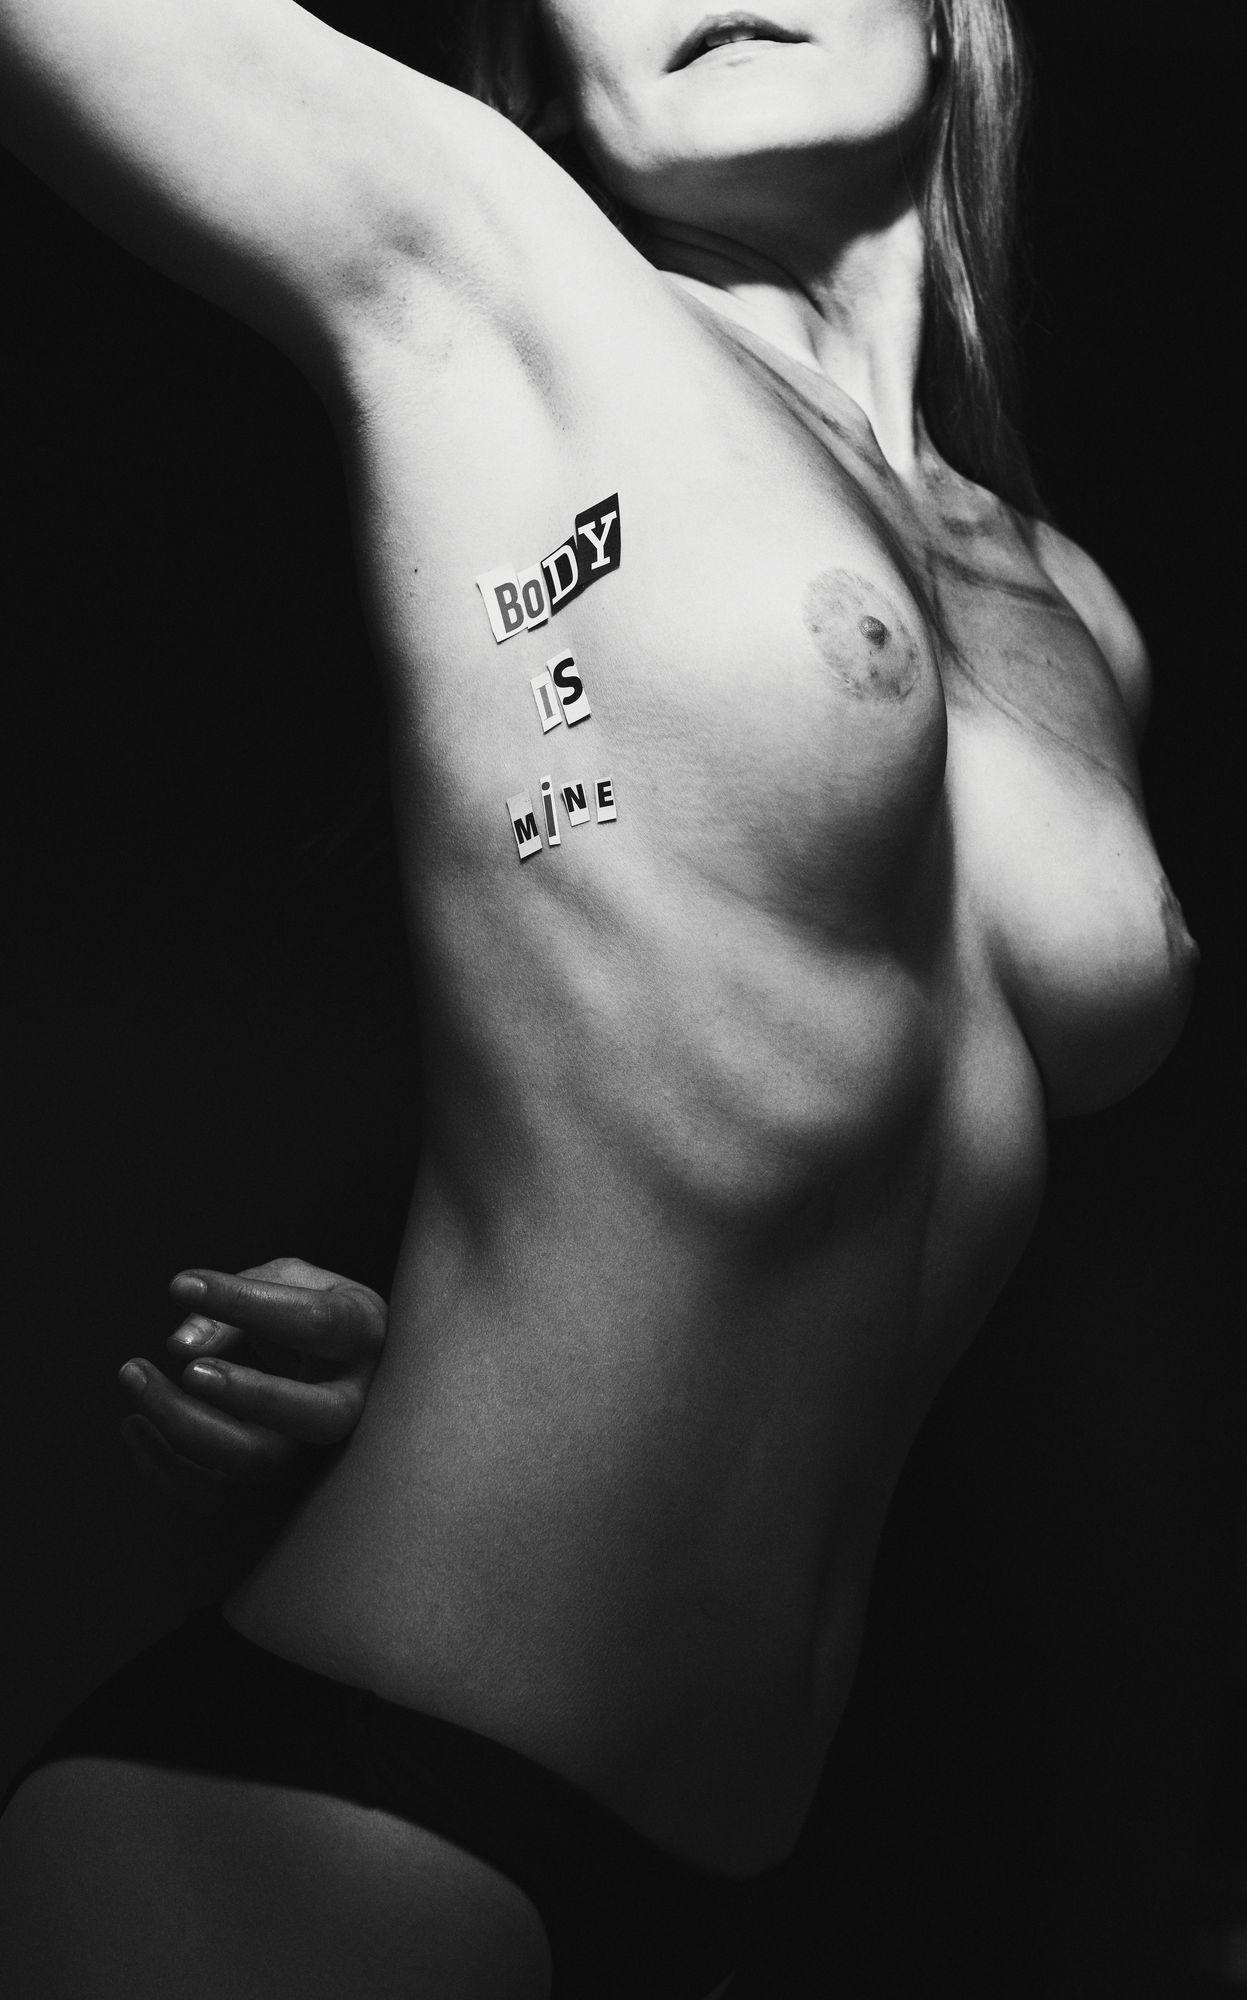 Body is mine